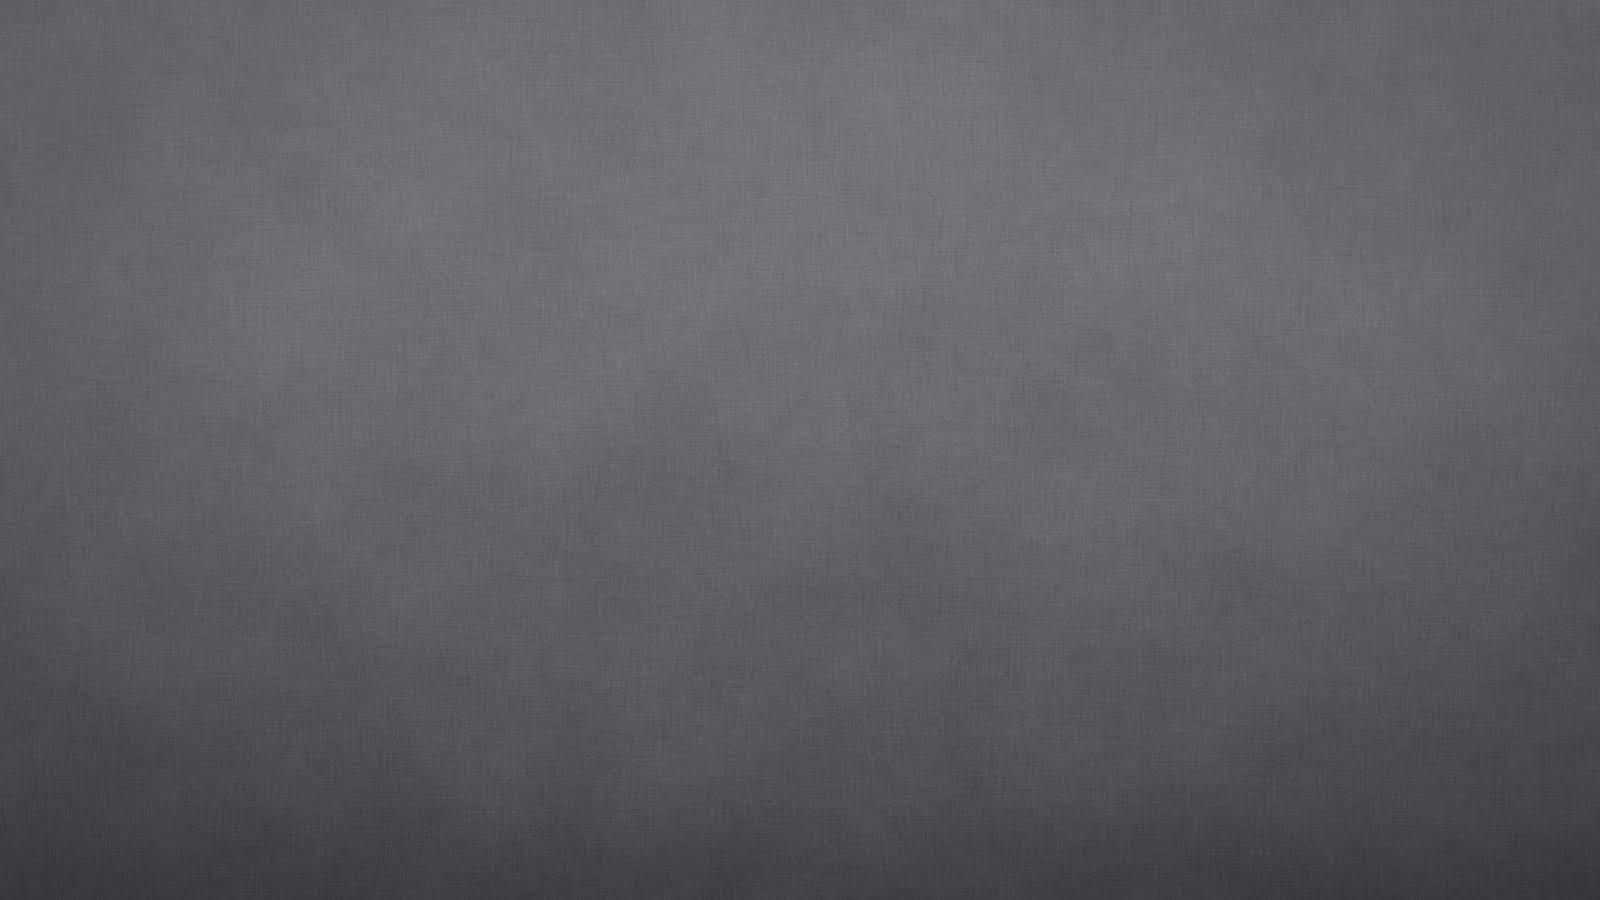 mac os x change login screen background